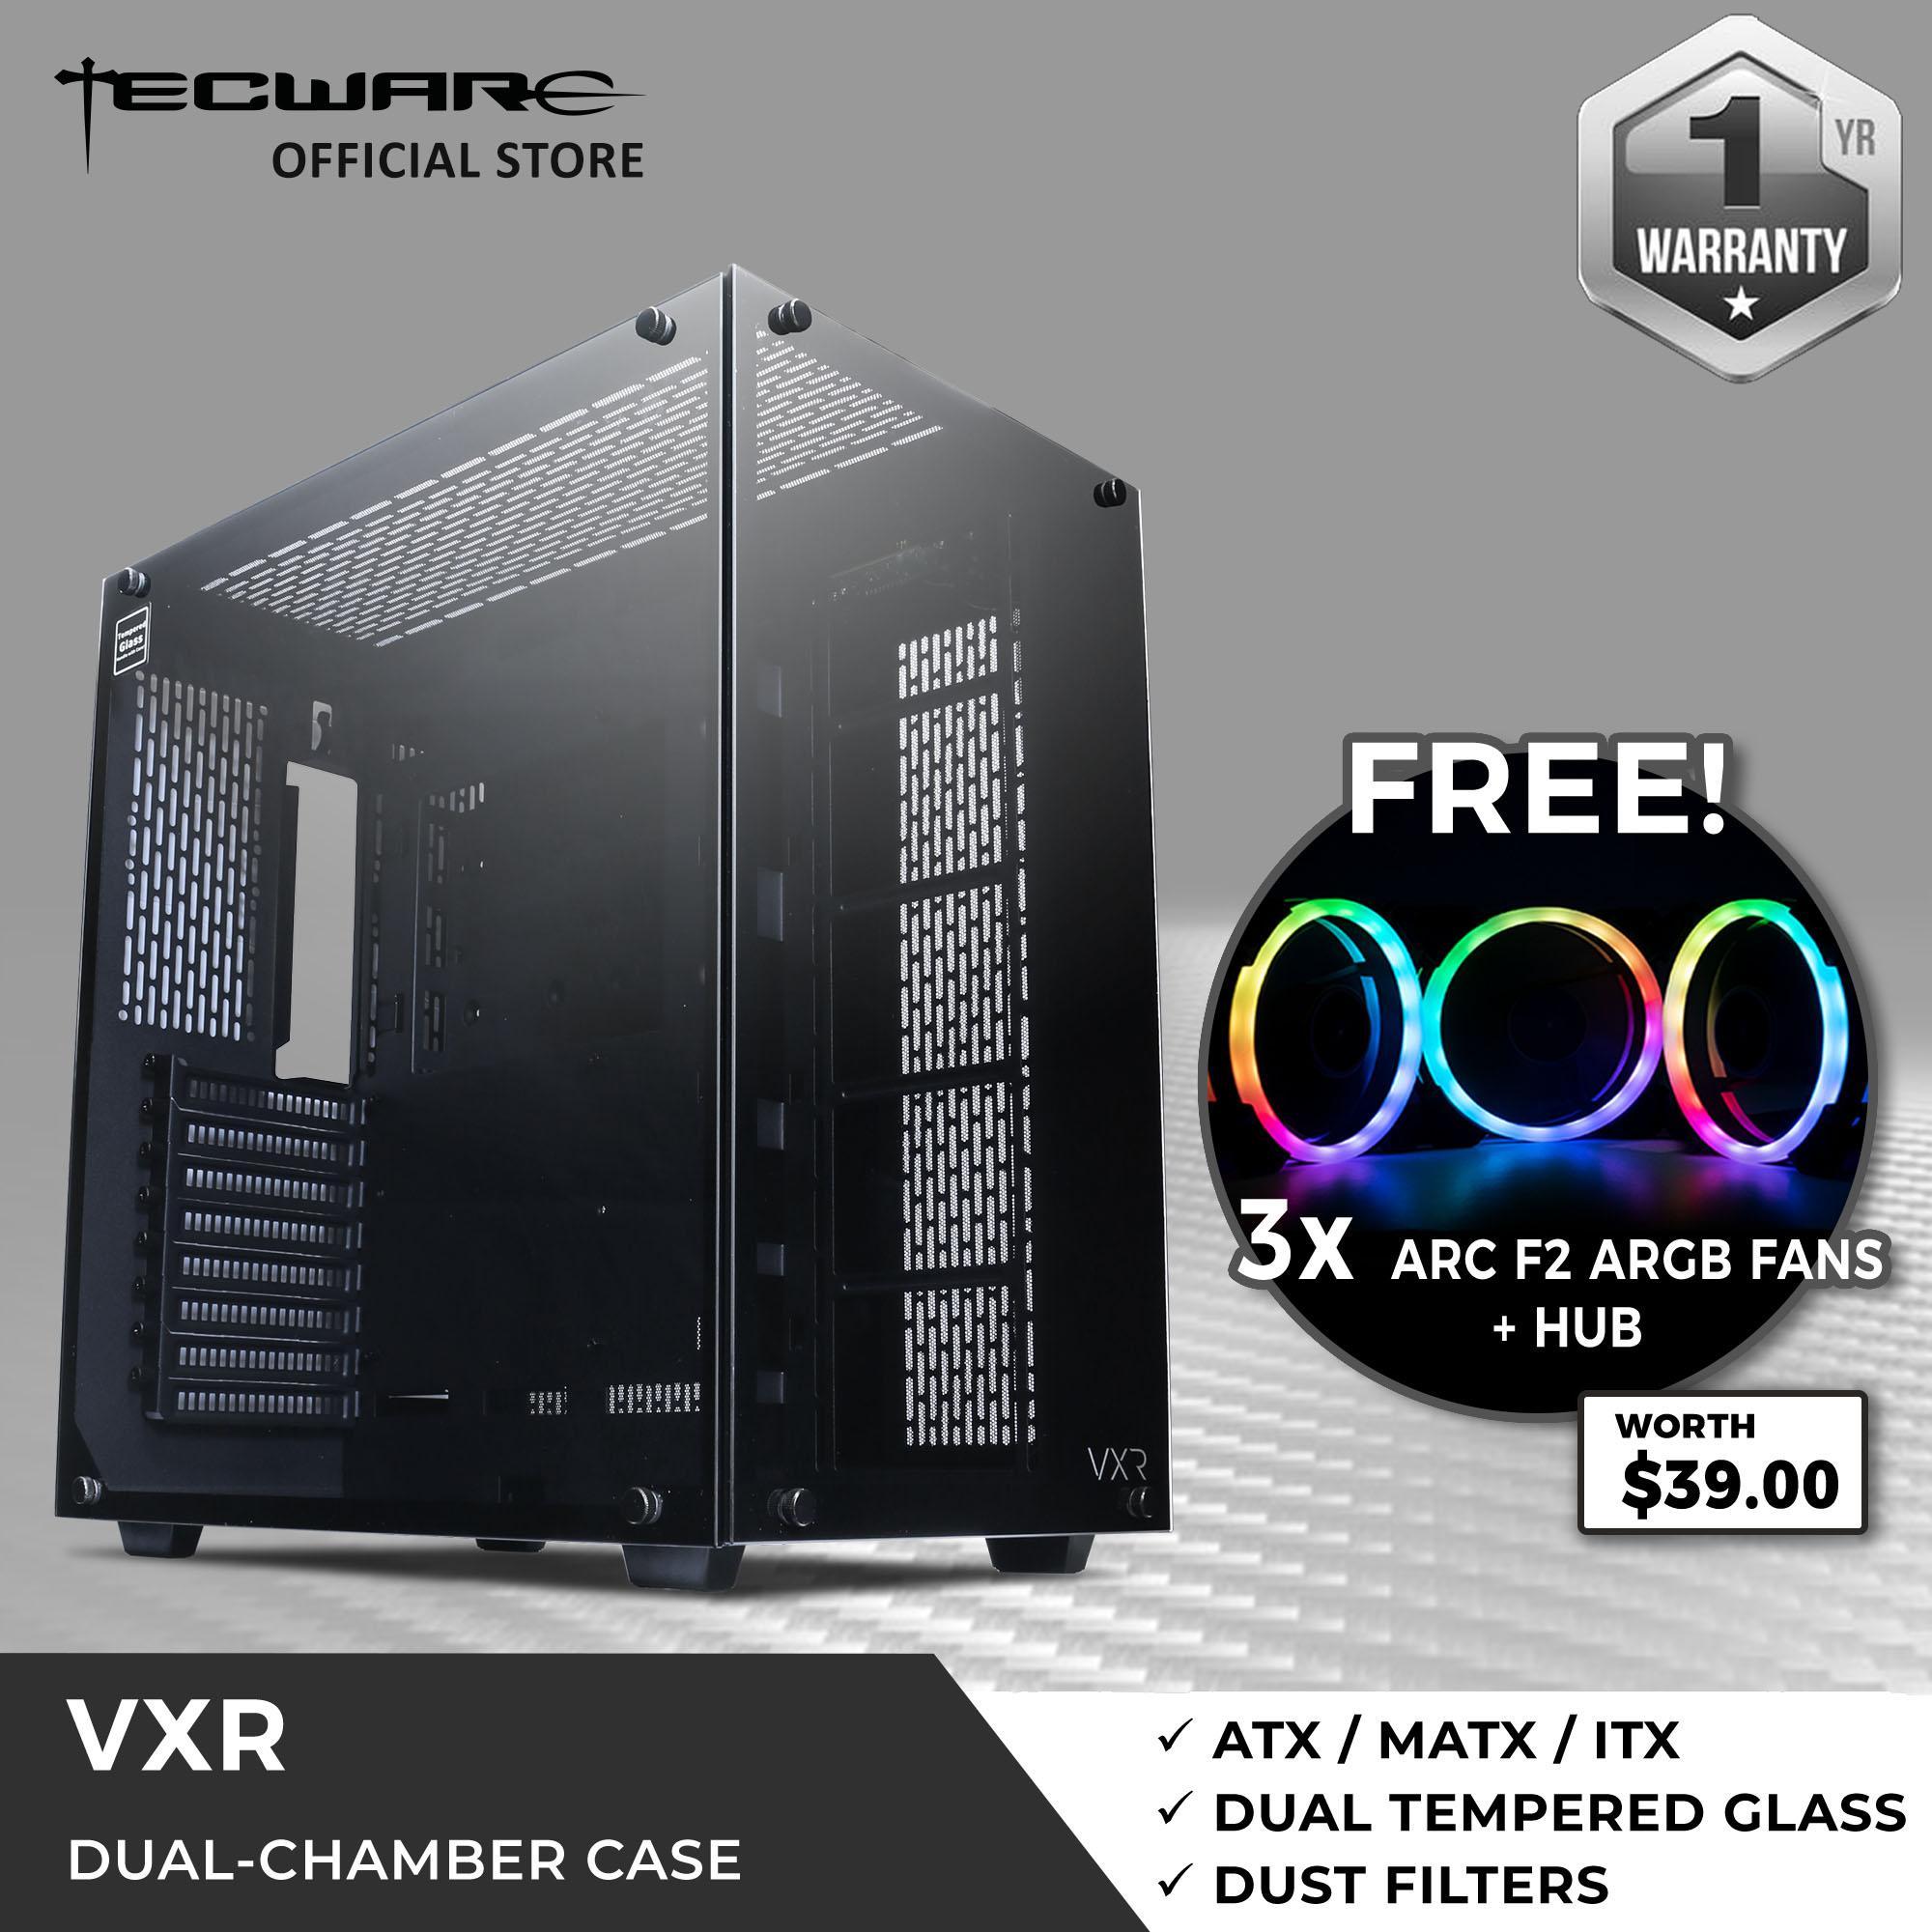 Buy Tecware VXR Dual Chamber TG Case + FREE 3 x ARC F2 ARGB Fans + Hub  Singapore